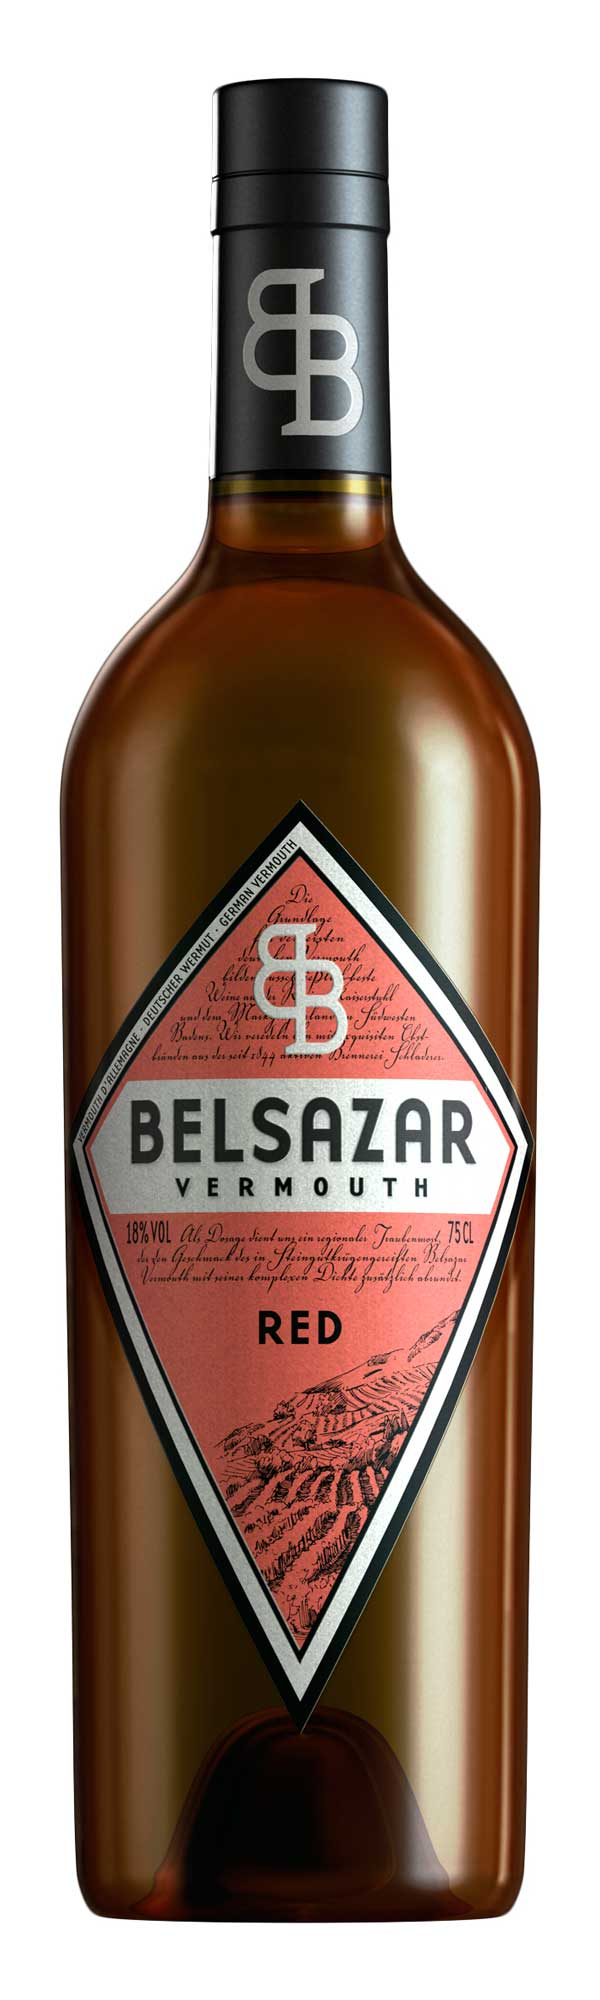 Vermouth Belsazar Red CL.75